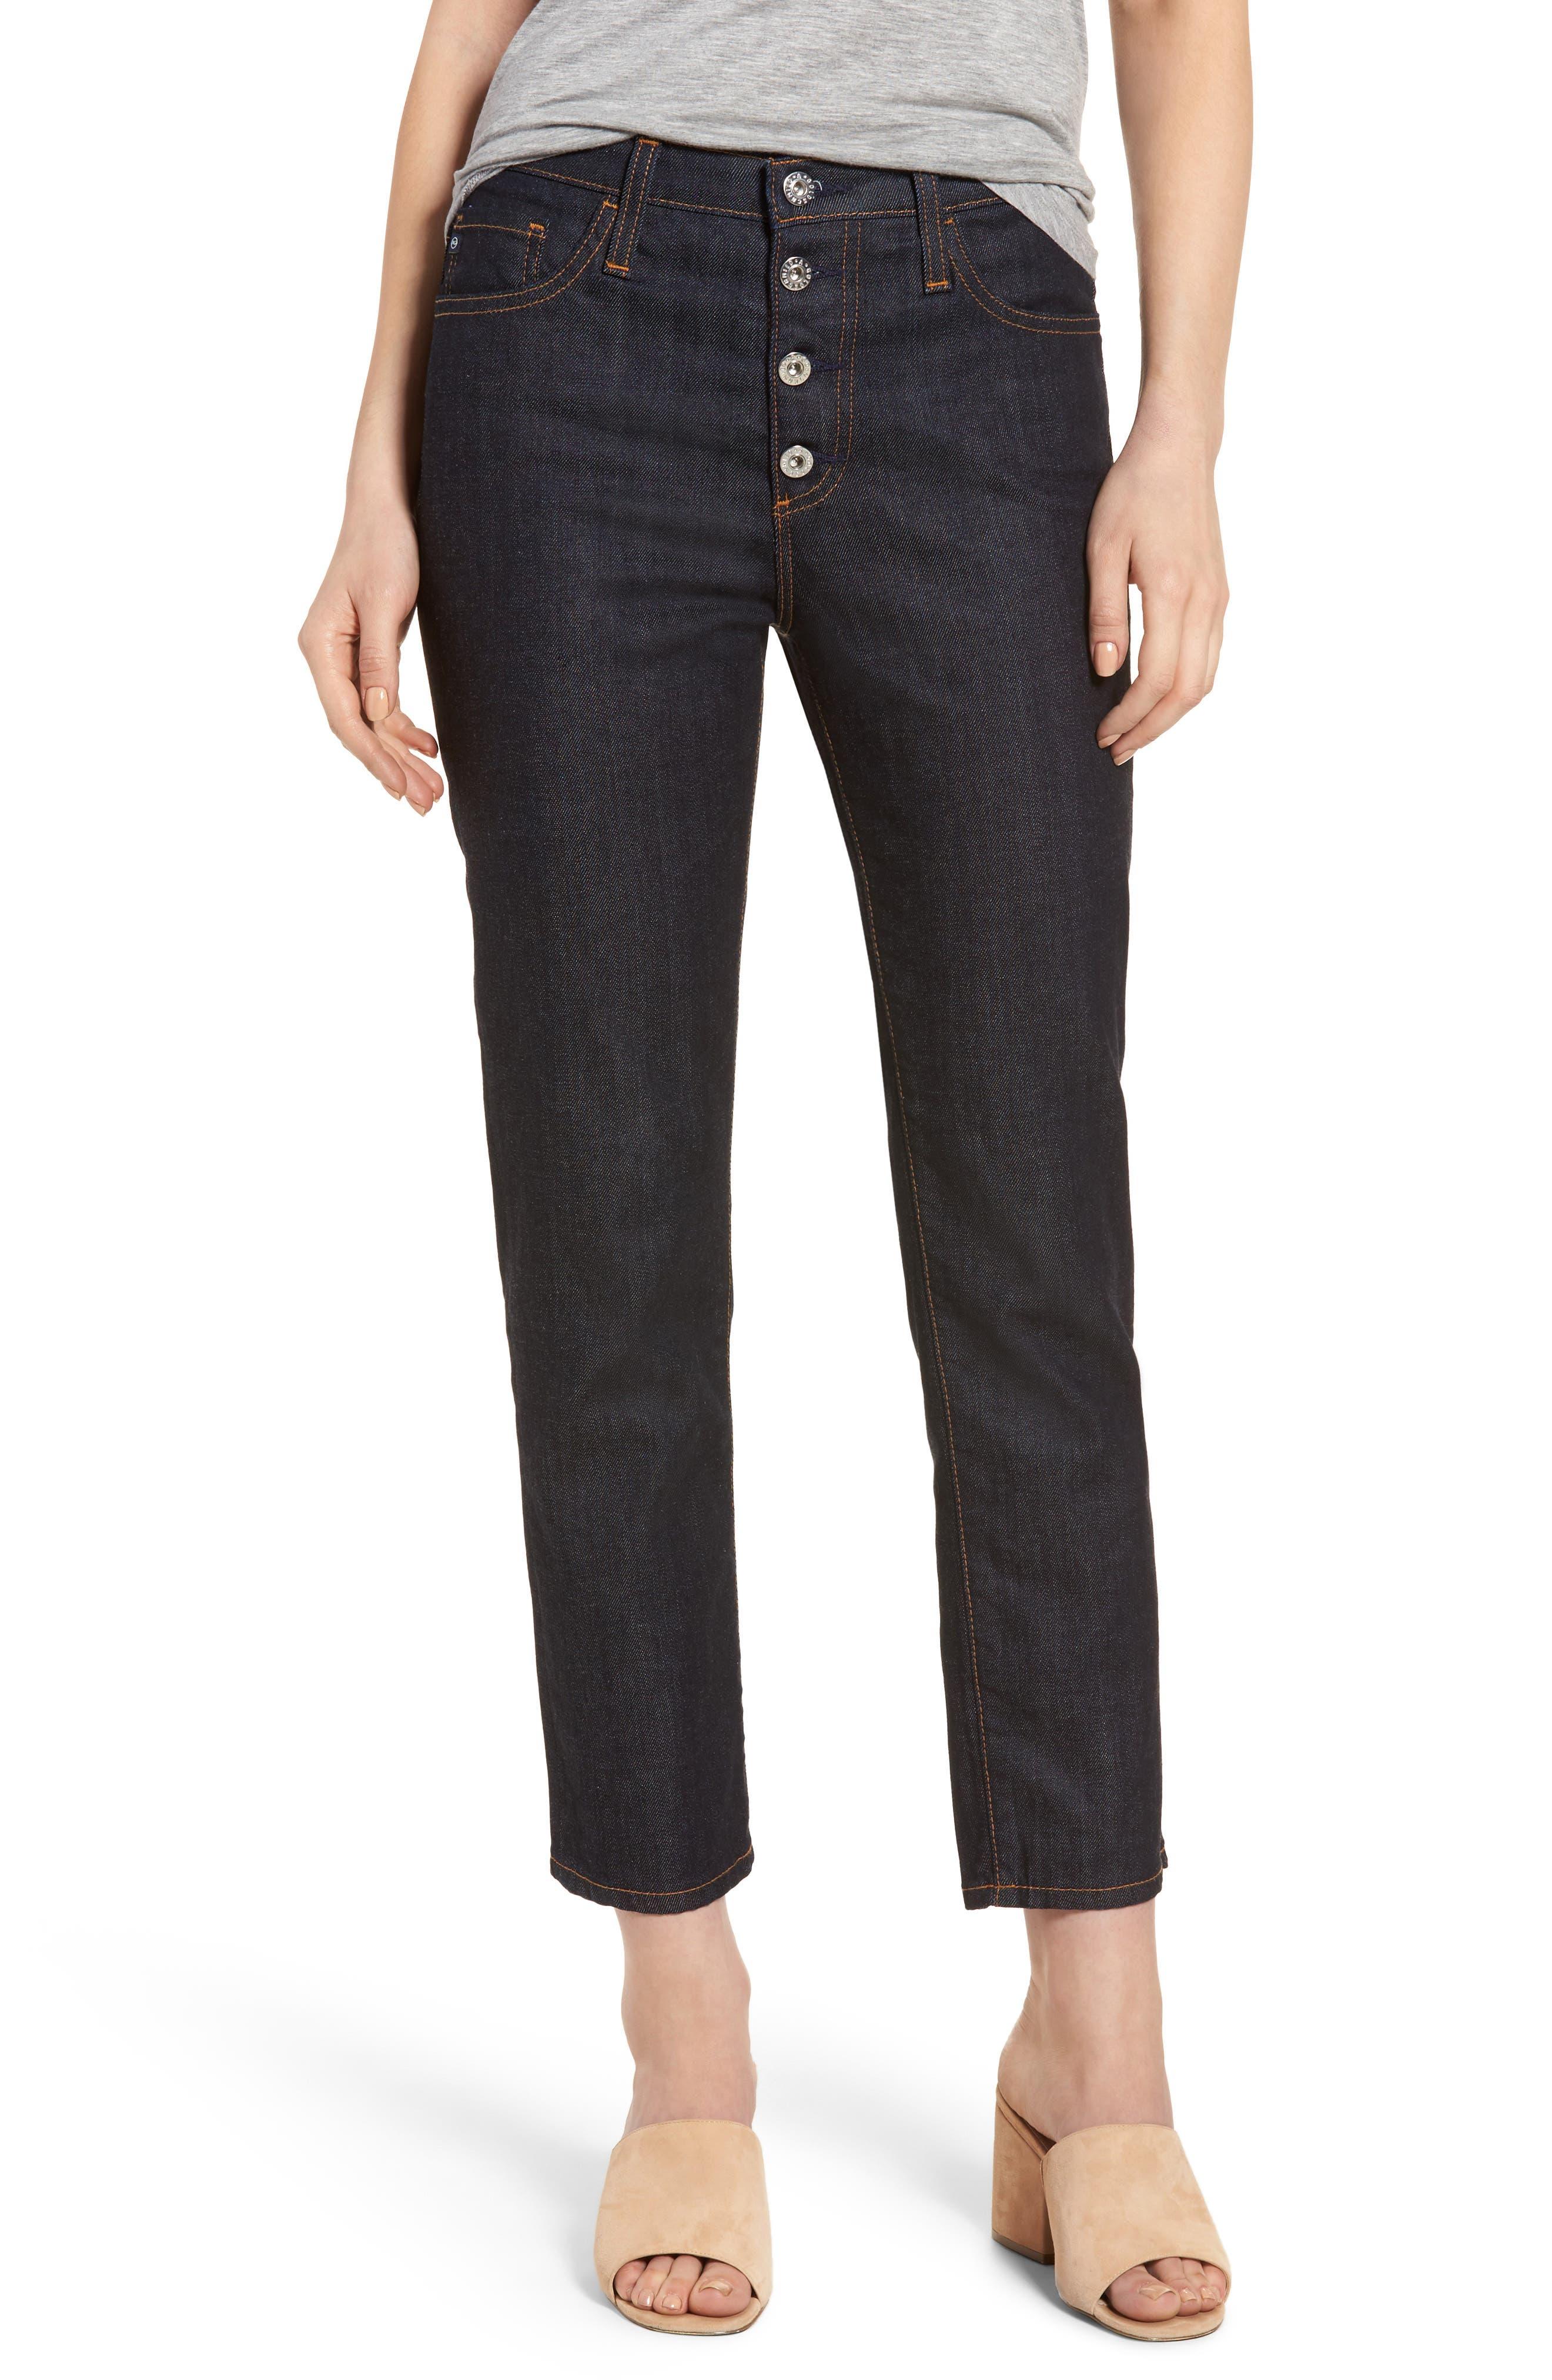 Isabelle High Waist Ankle Jeans,                         Main,                         color, Indigo Autumn